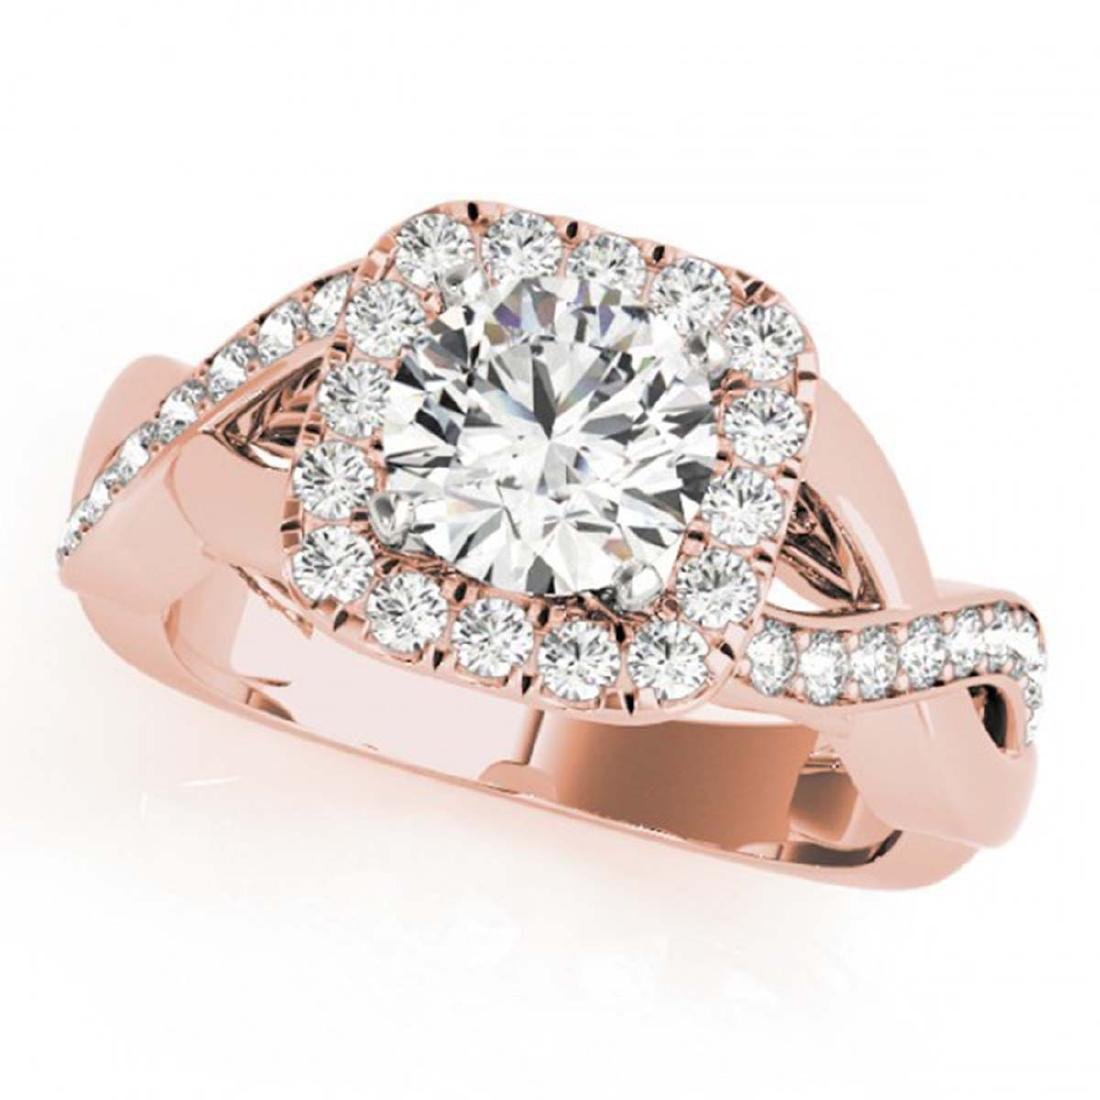 1.65 ctw VS/SI Diamond Halo Ring 18K Rose Gold -